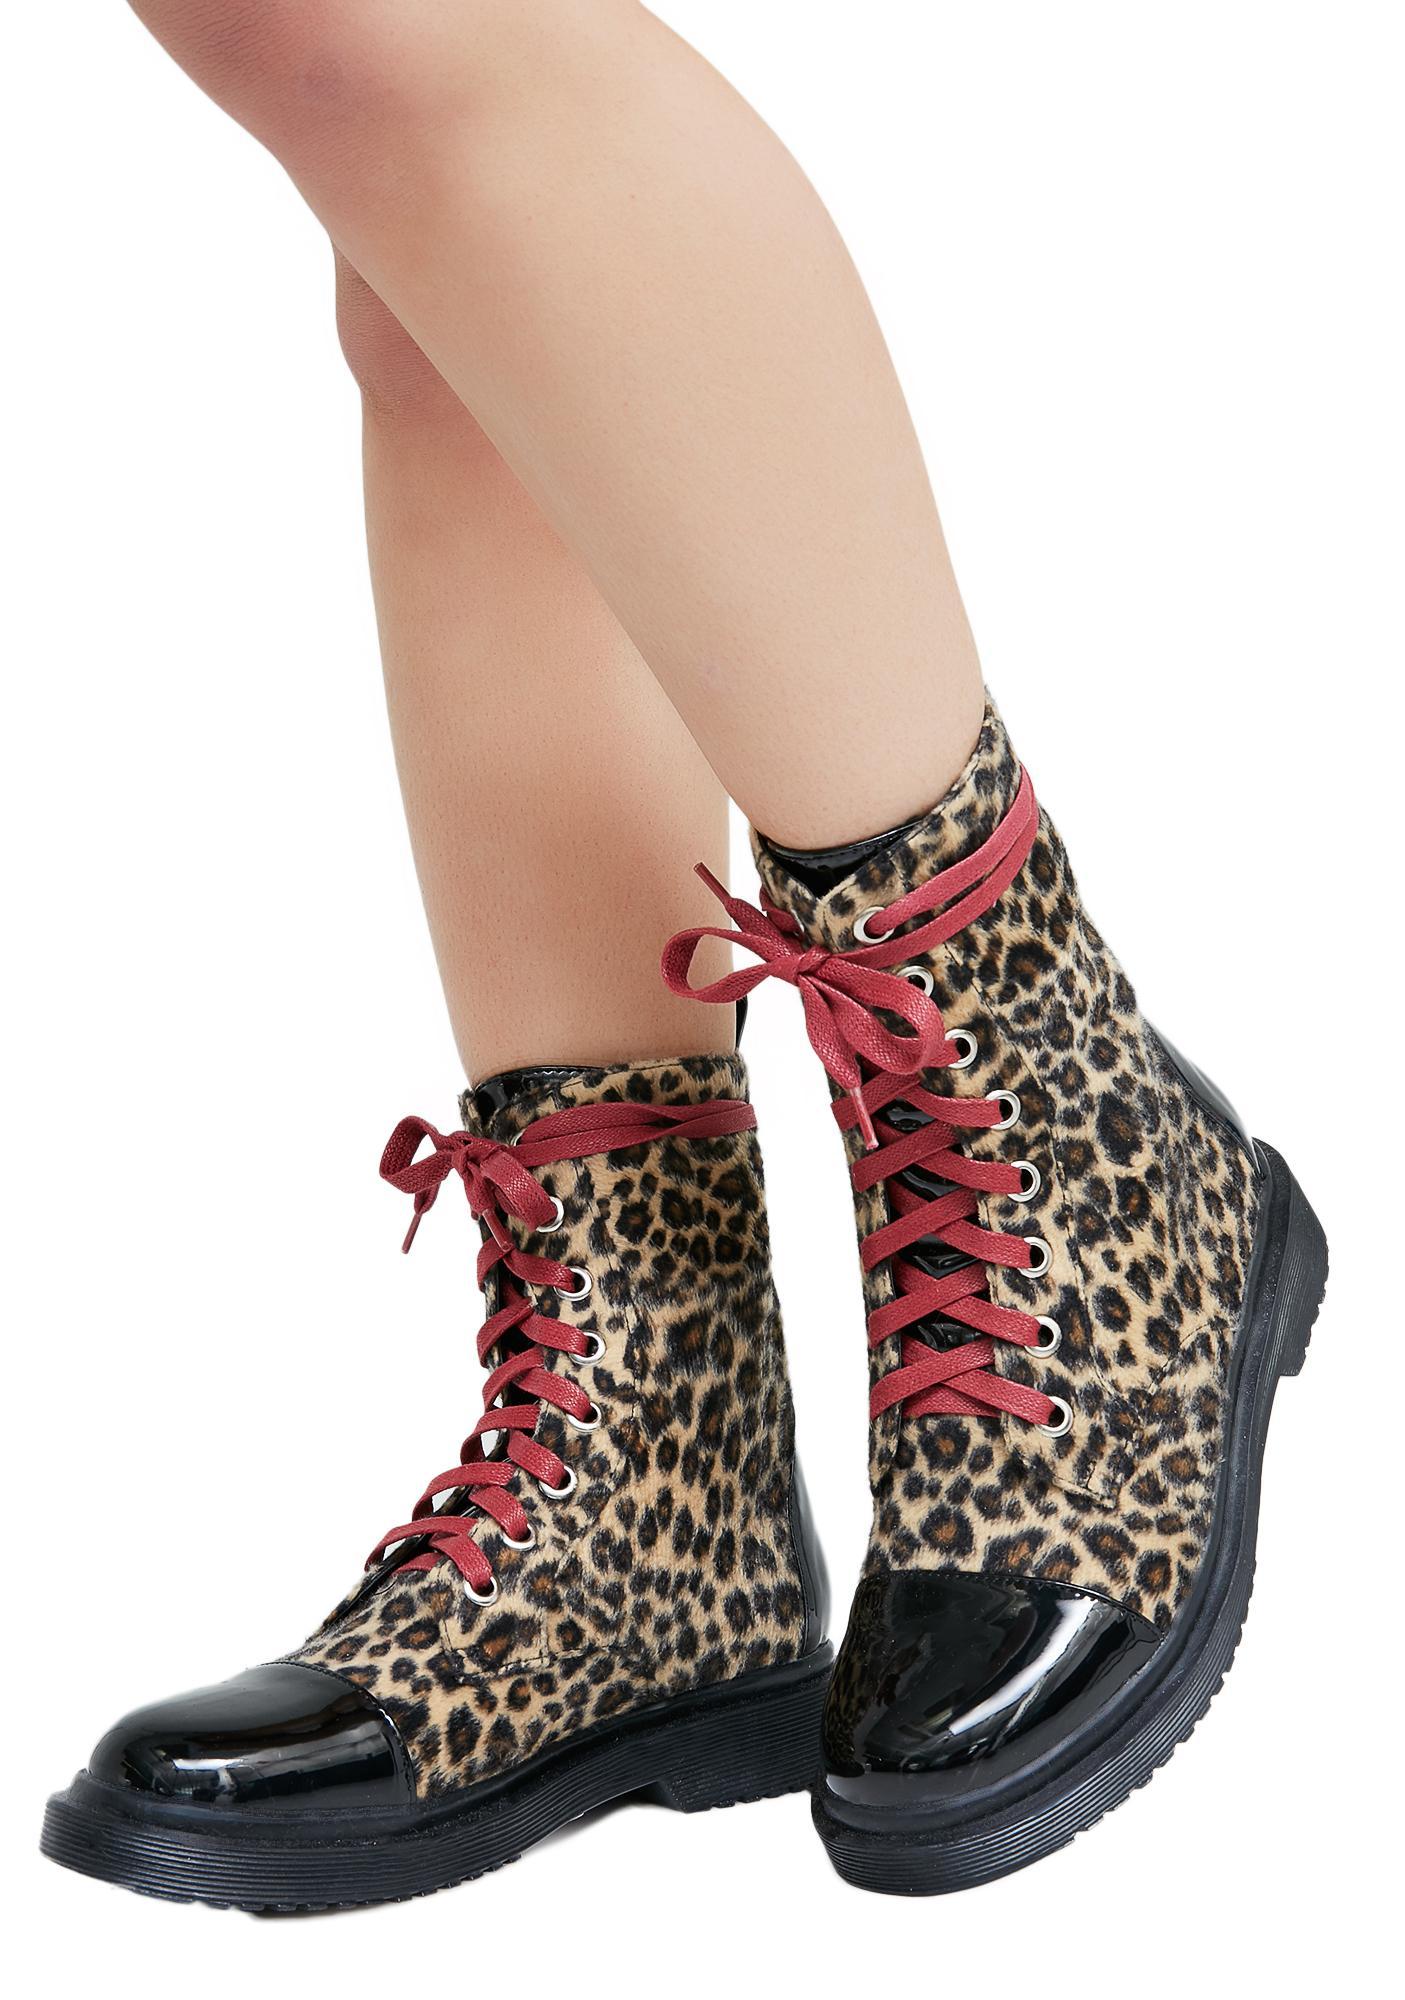 Current Mood Fiercely Ferocious Leopard Combat Boots